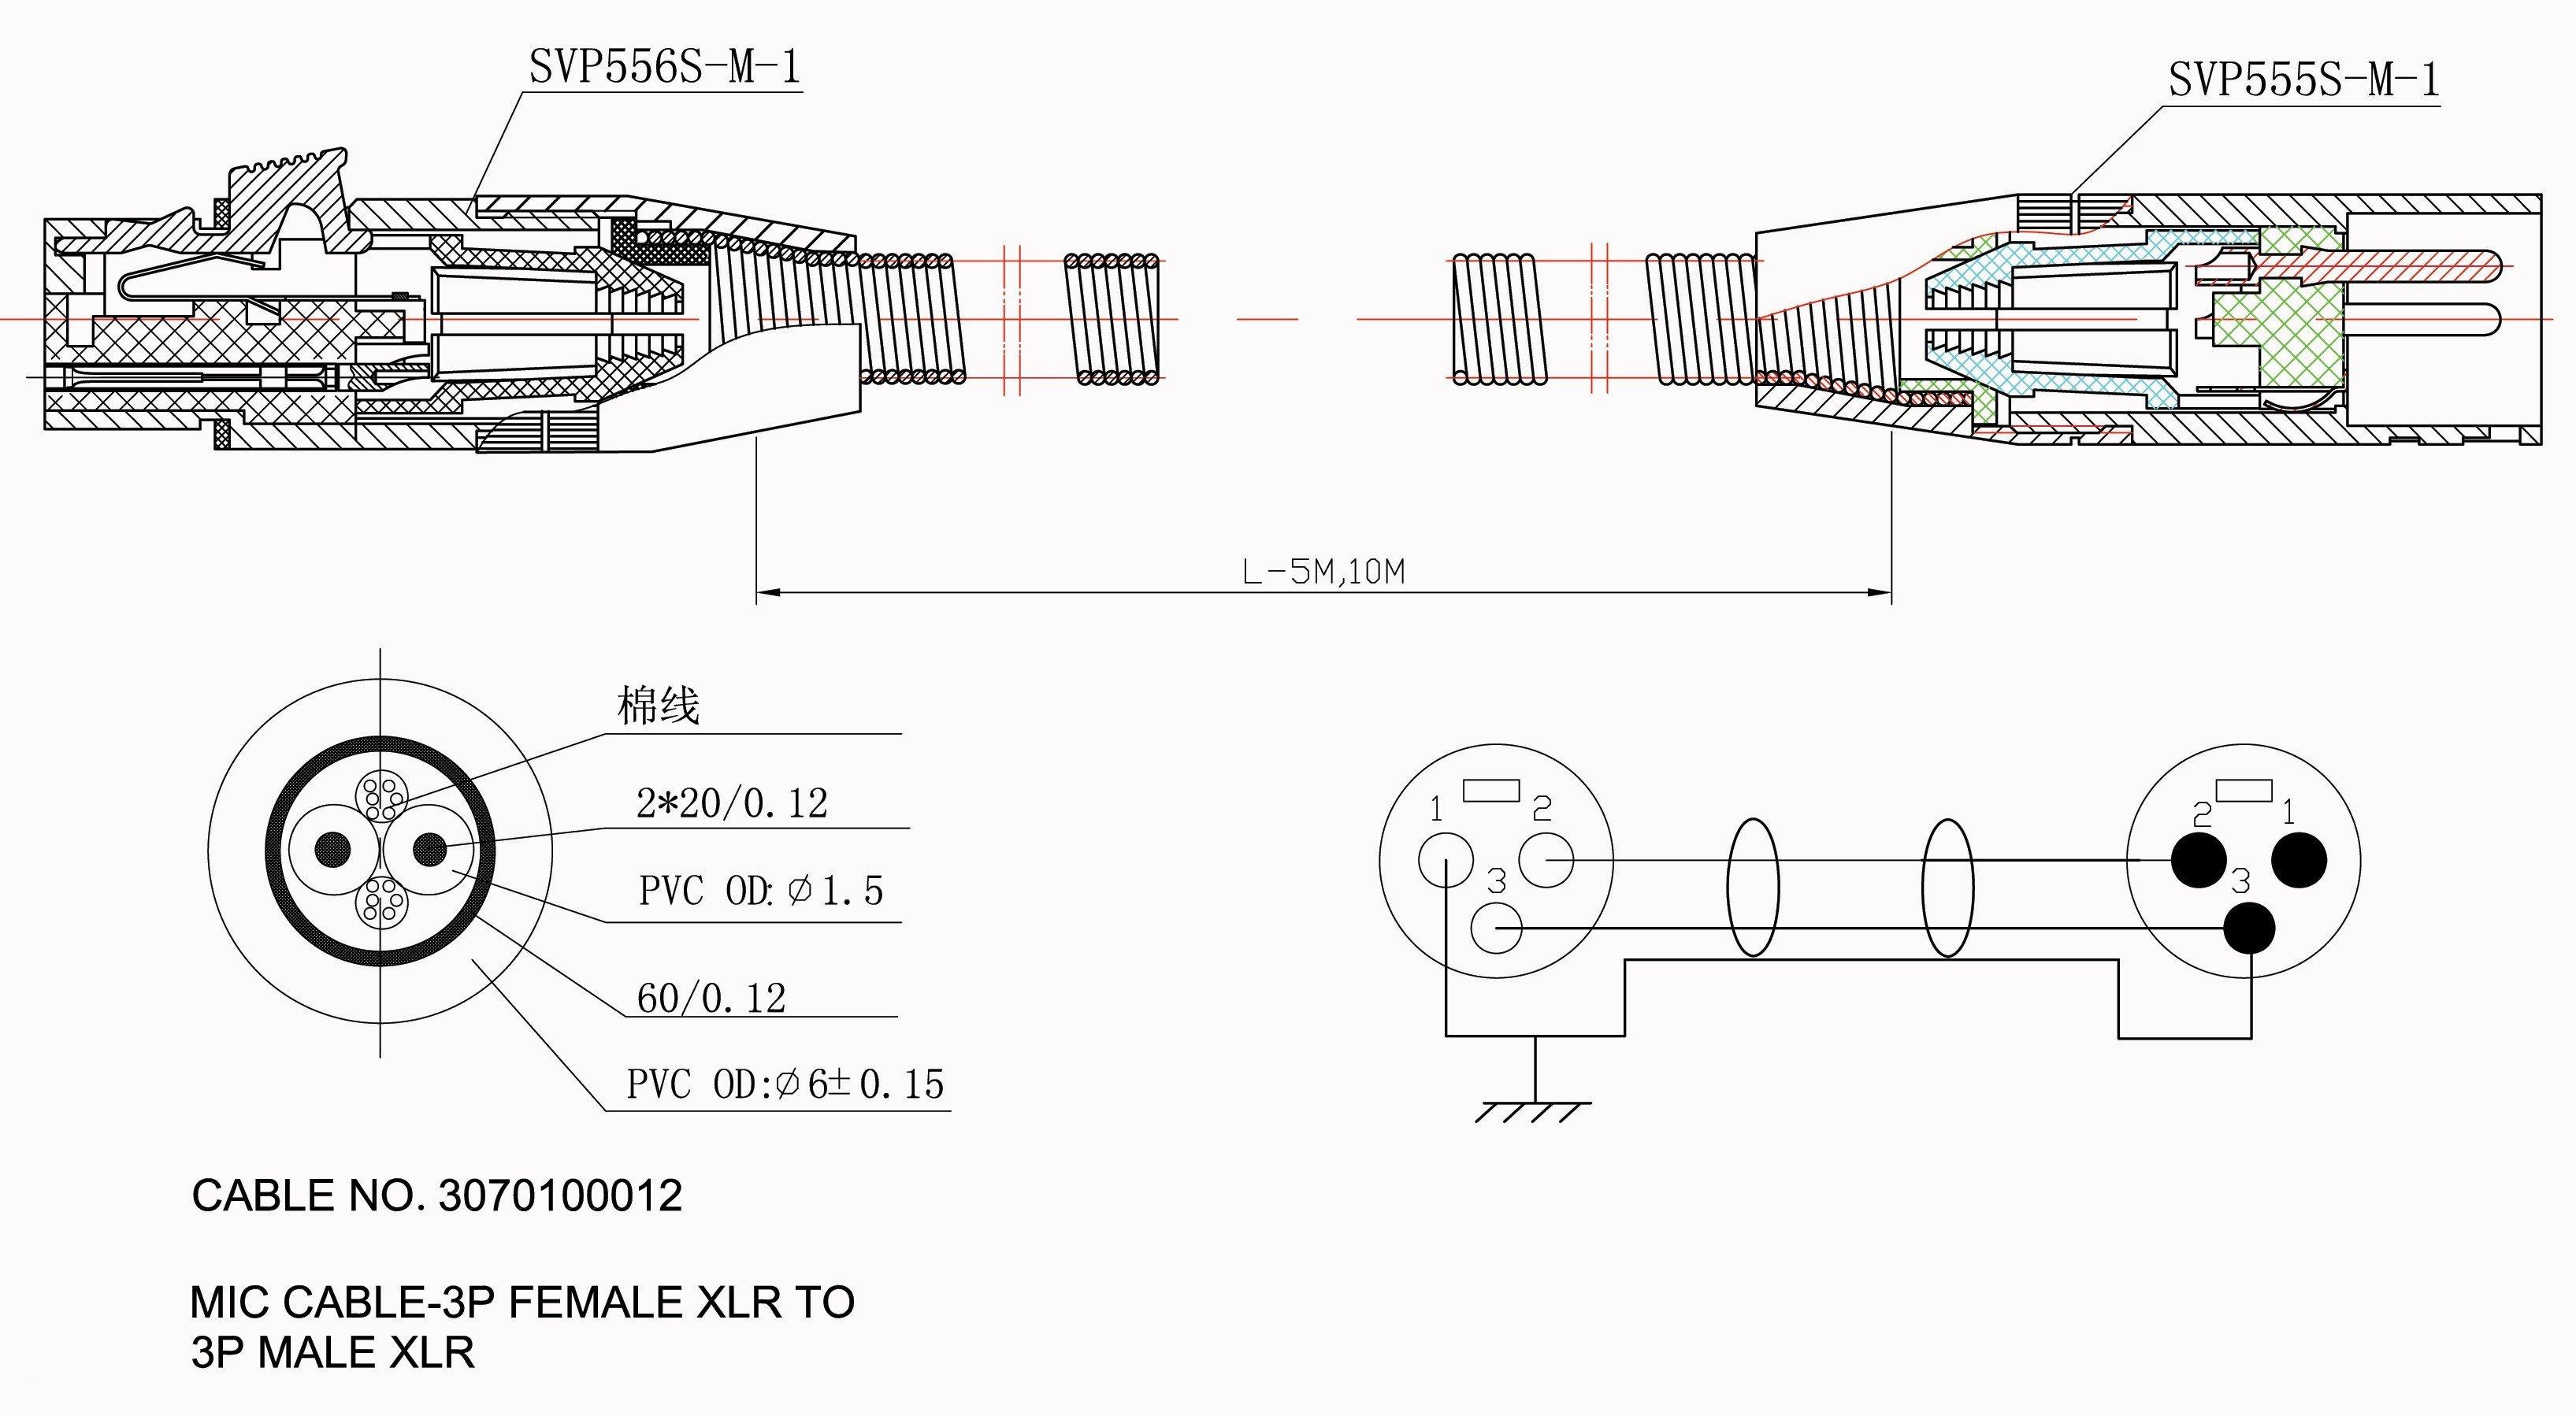 Female Jack Wiring Diagram | Wiring Library - 3.5 Mm Female Jack Wiring Diagram